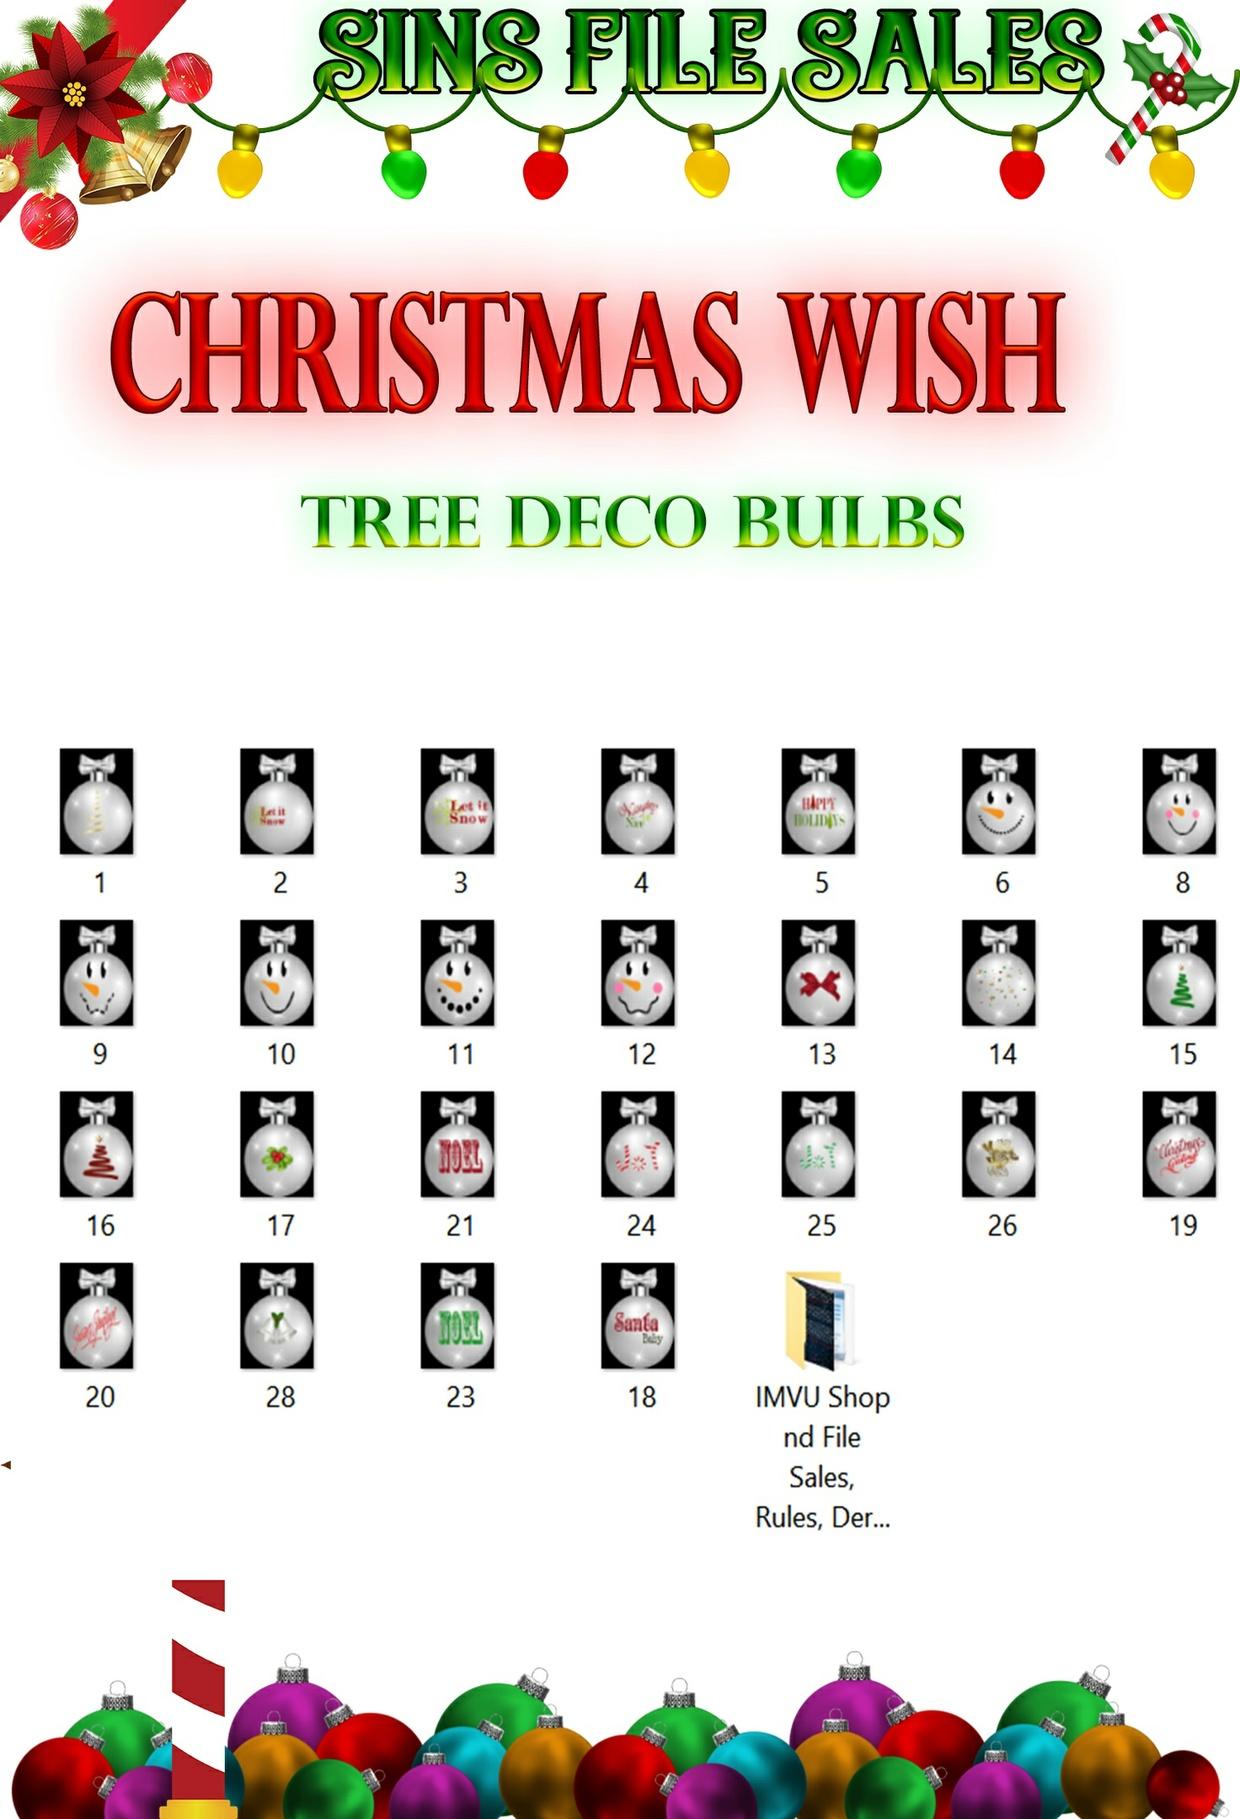 Christmas Wish-Tree Deco Bulbs